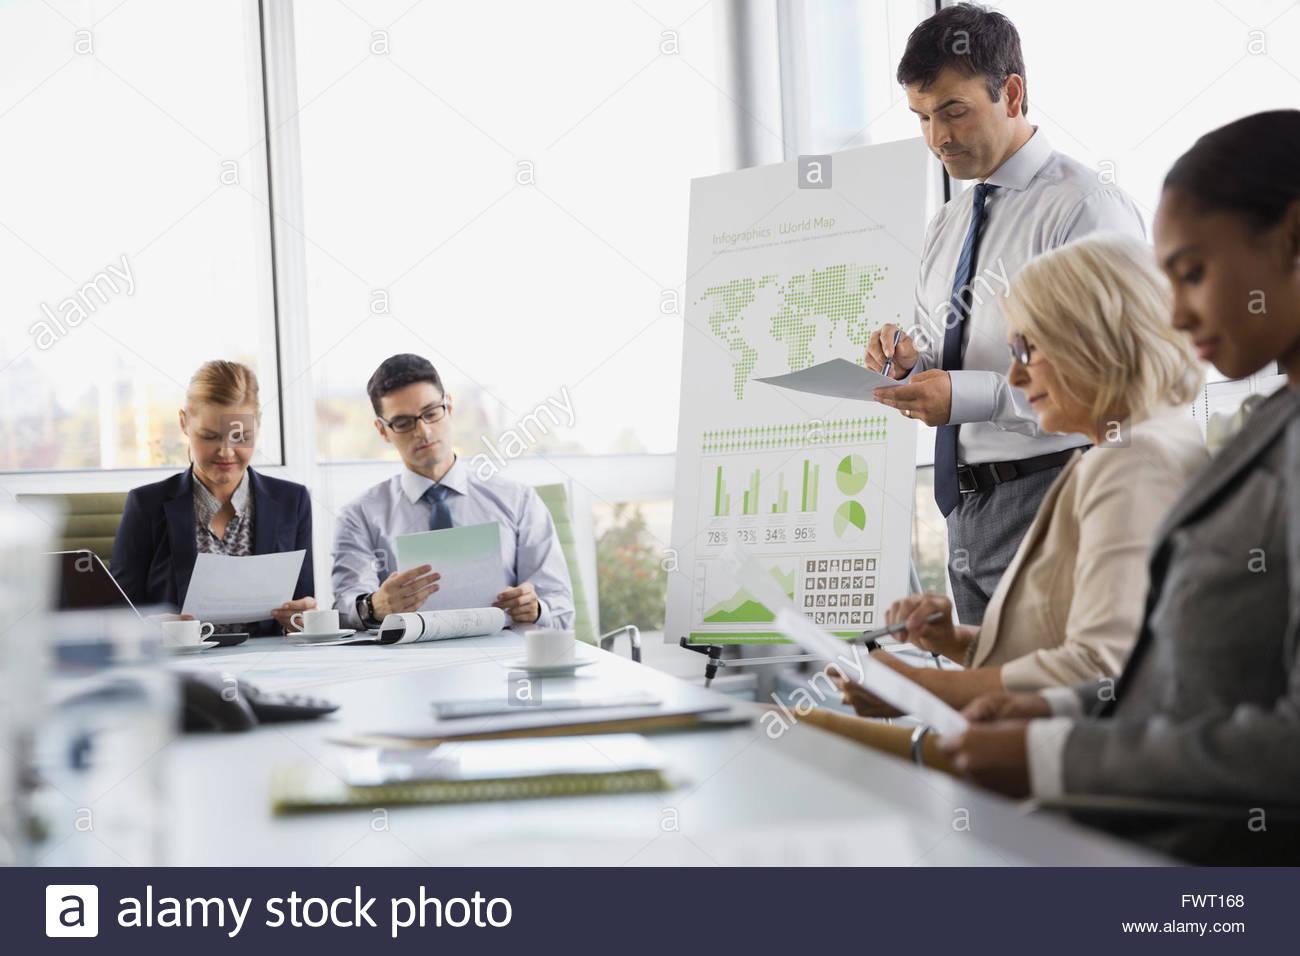 Multi-ethnic business people in boardroom meeting - Stock Image